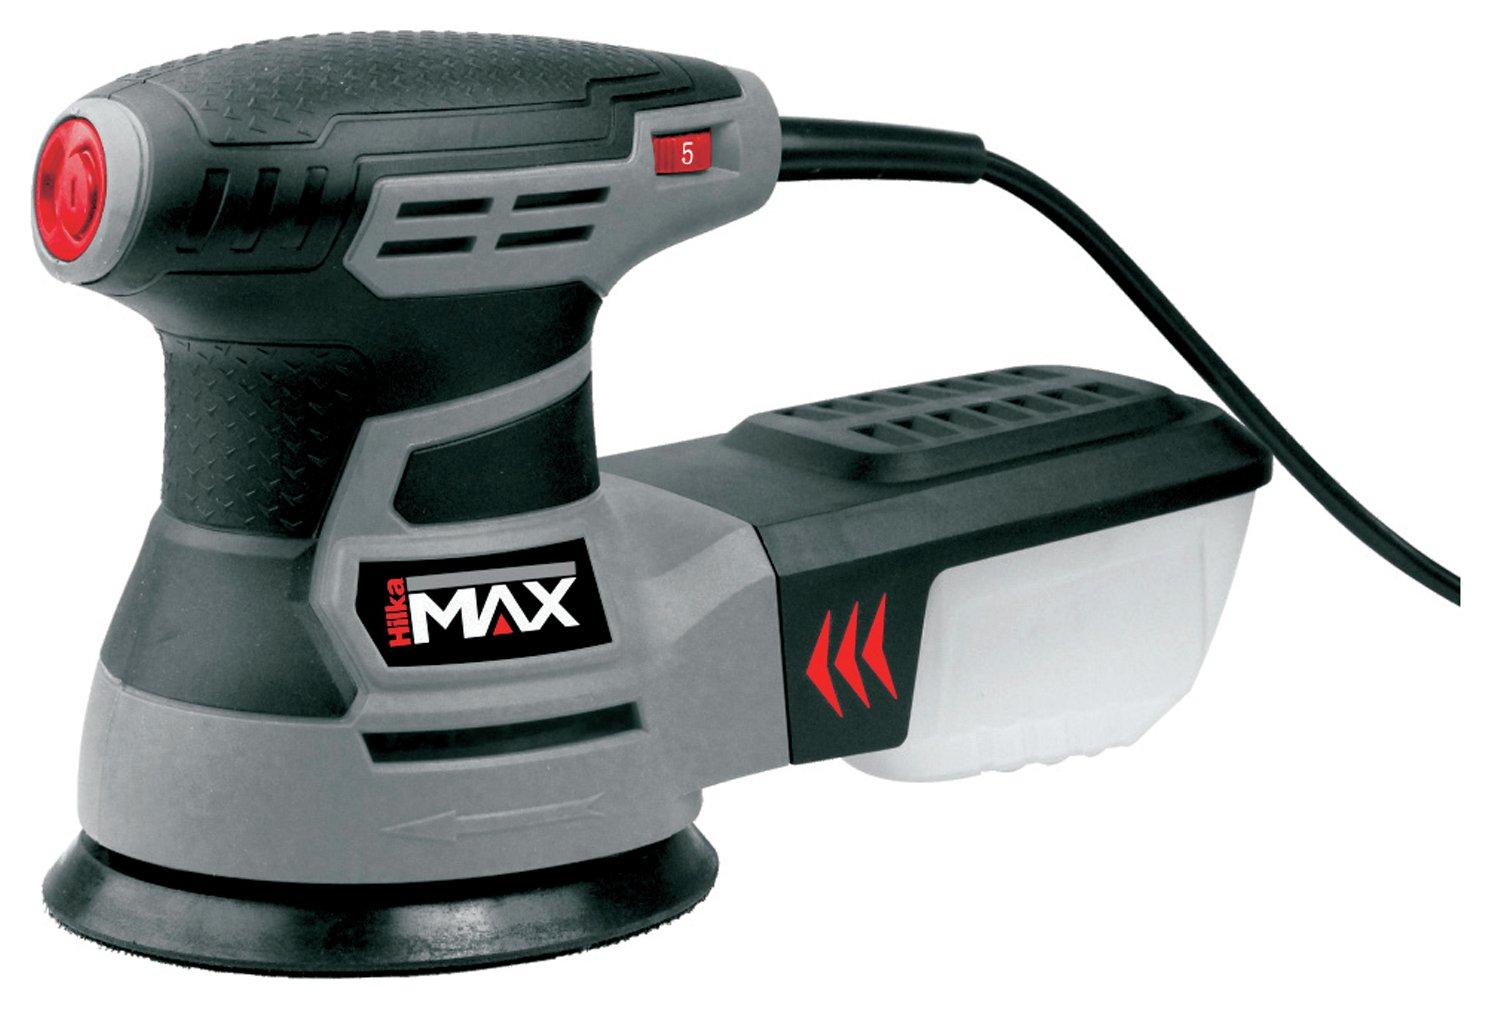 Image of Hilka Max 350w Random Orbit Sander.